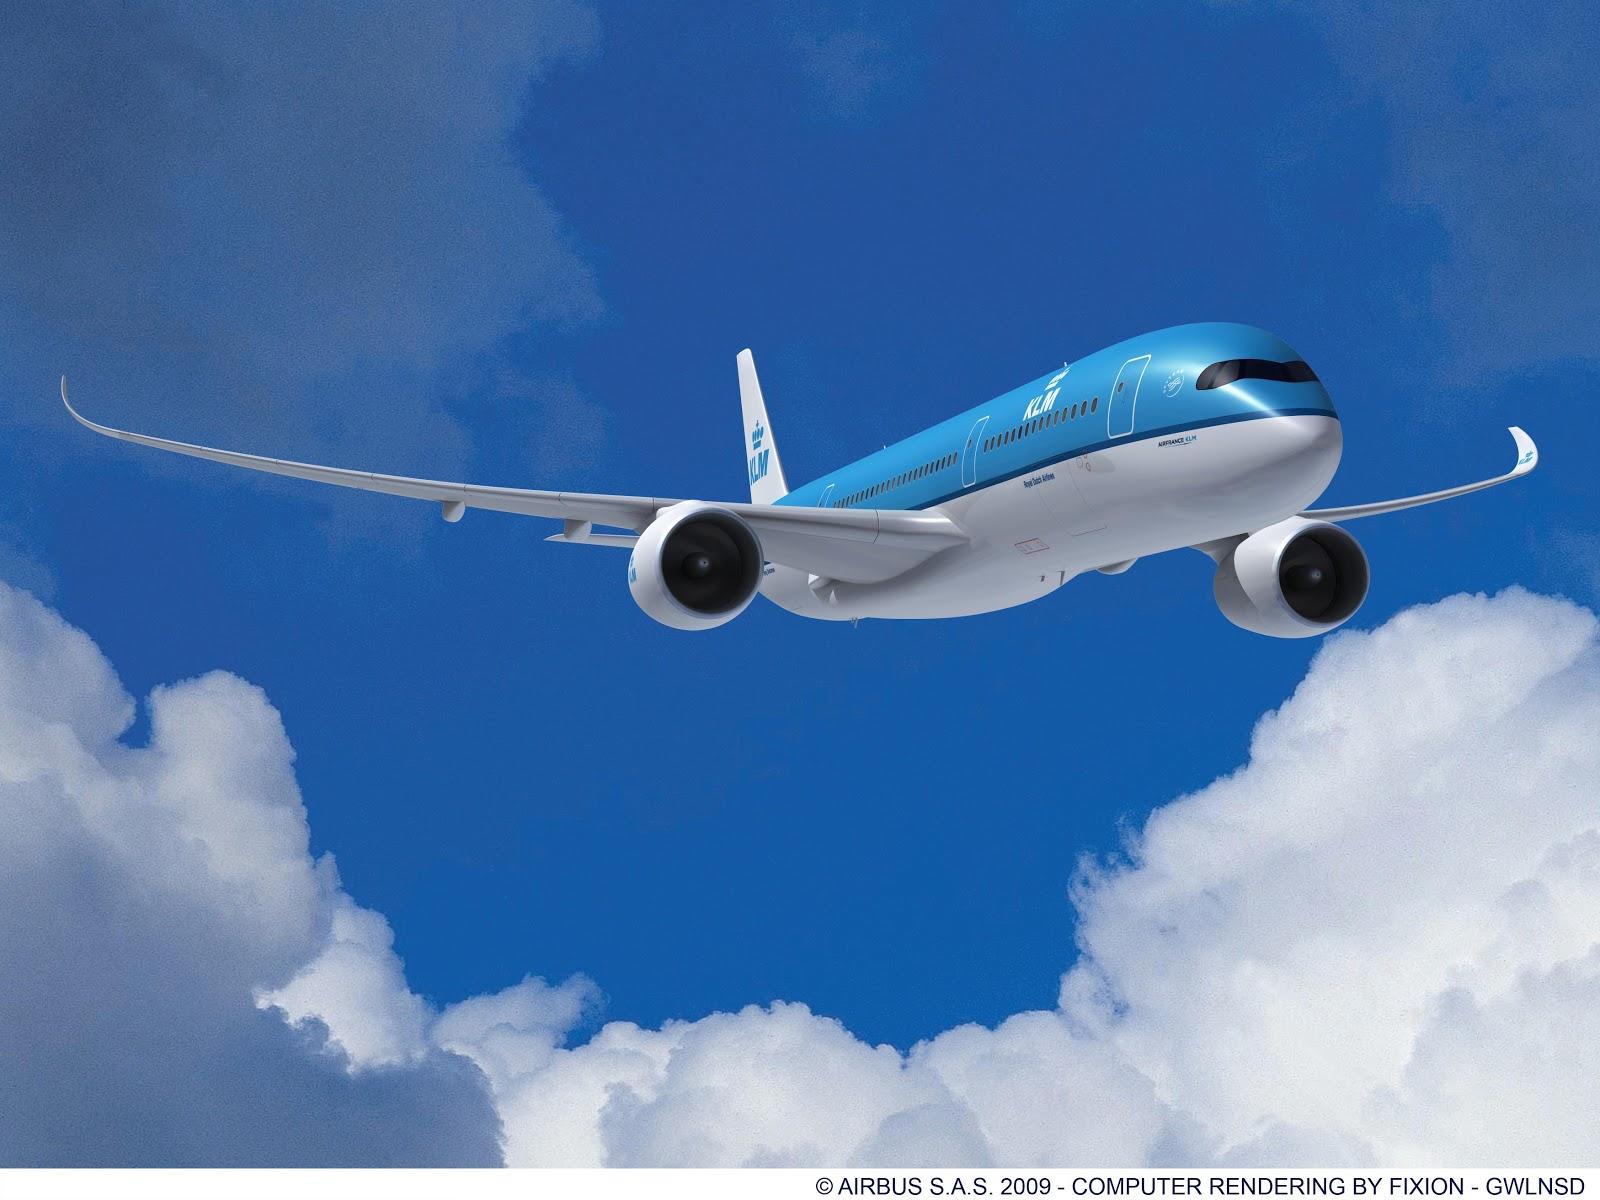 http://1.bp.blogspot.com/-H0_IzdFbVU4/UHu1qauBFWI/AAAAAAAAAYk/BdxOShzrEGw/s1600/A350-900_KLM.jpg